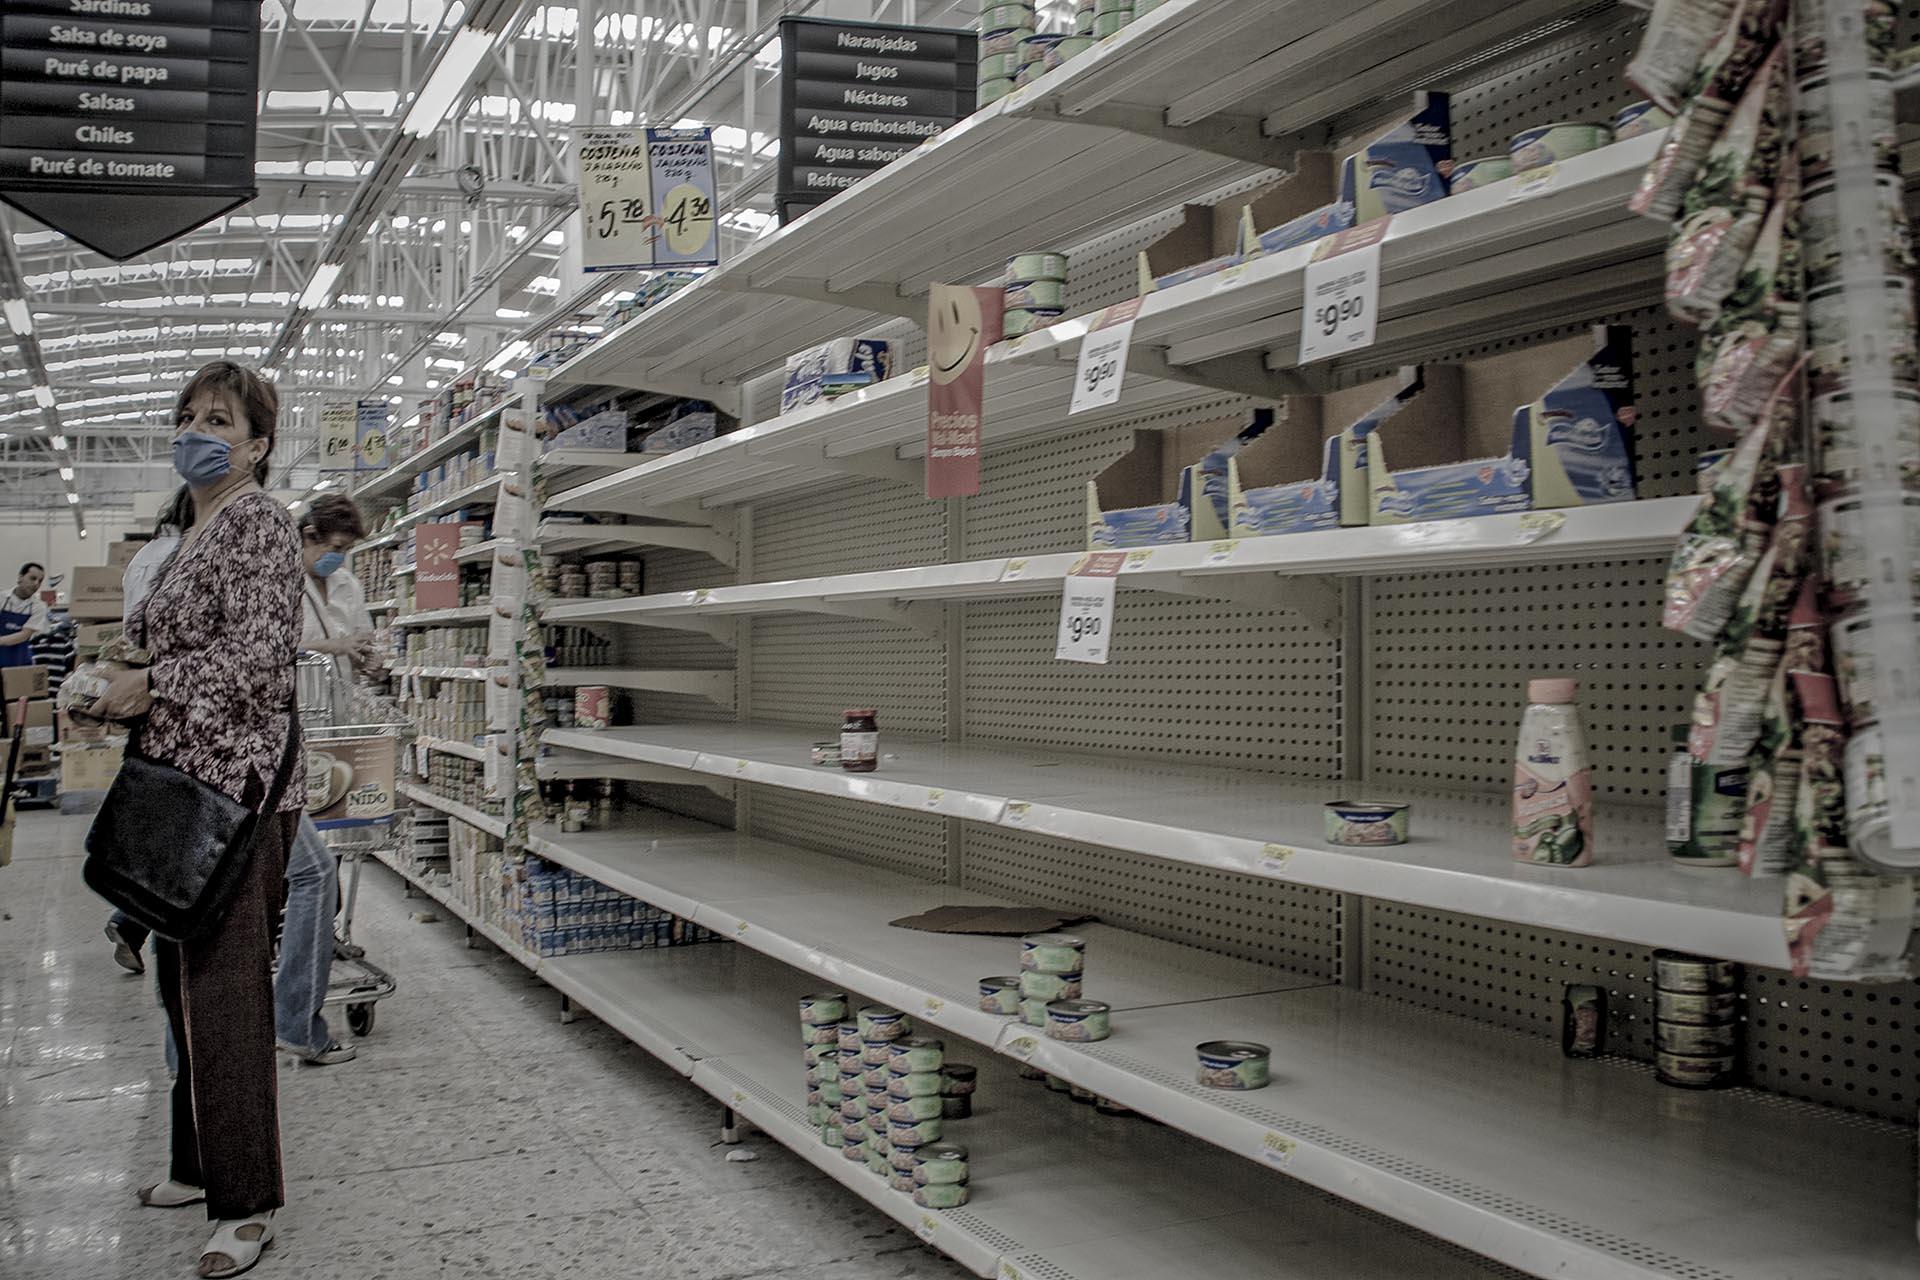 Granite worktops quartz supply problems supermarkets empty shelves sand joinery